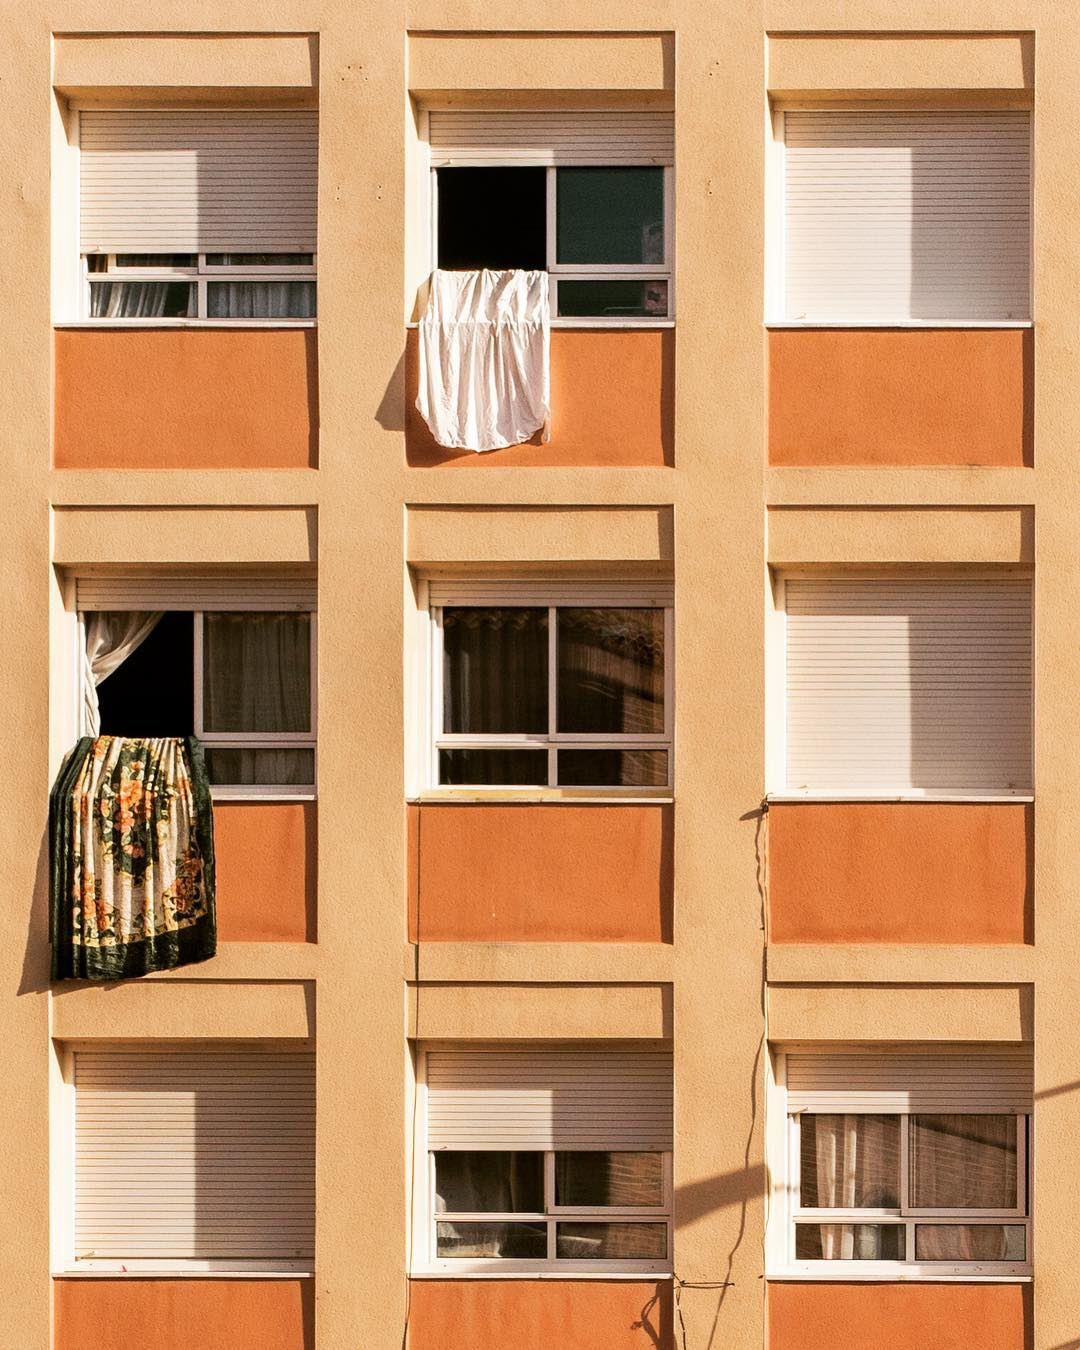 fotografo Joaquin Lucas paleta de colores de Wes Anderson  (19)